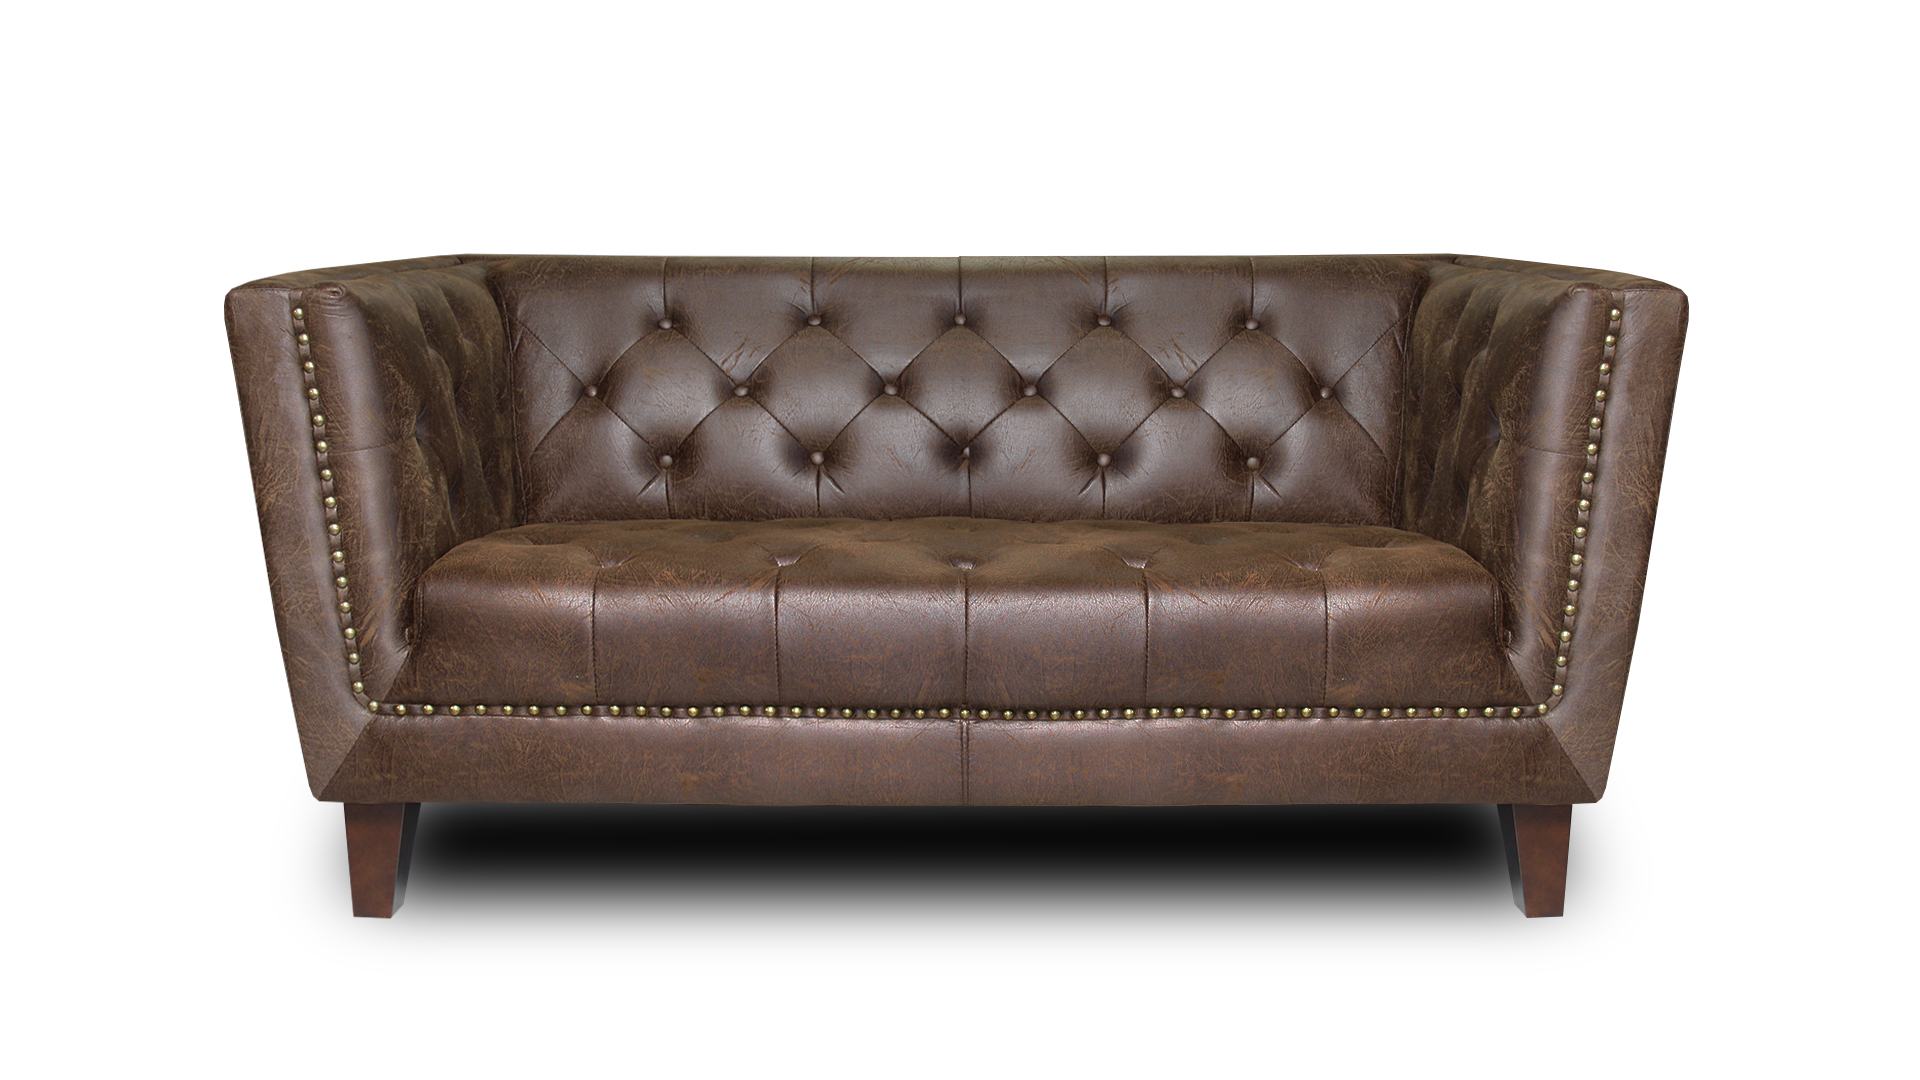 canape 2places capitonne maringa mobiliermoss le blog mobilier moss. Black Bedroom Furniture Sets. Home Design Ideas